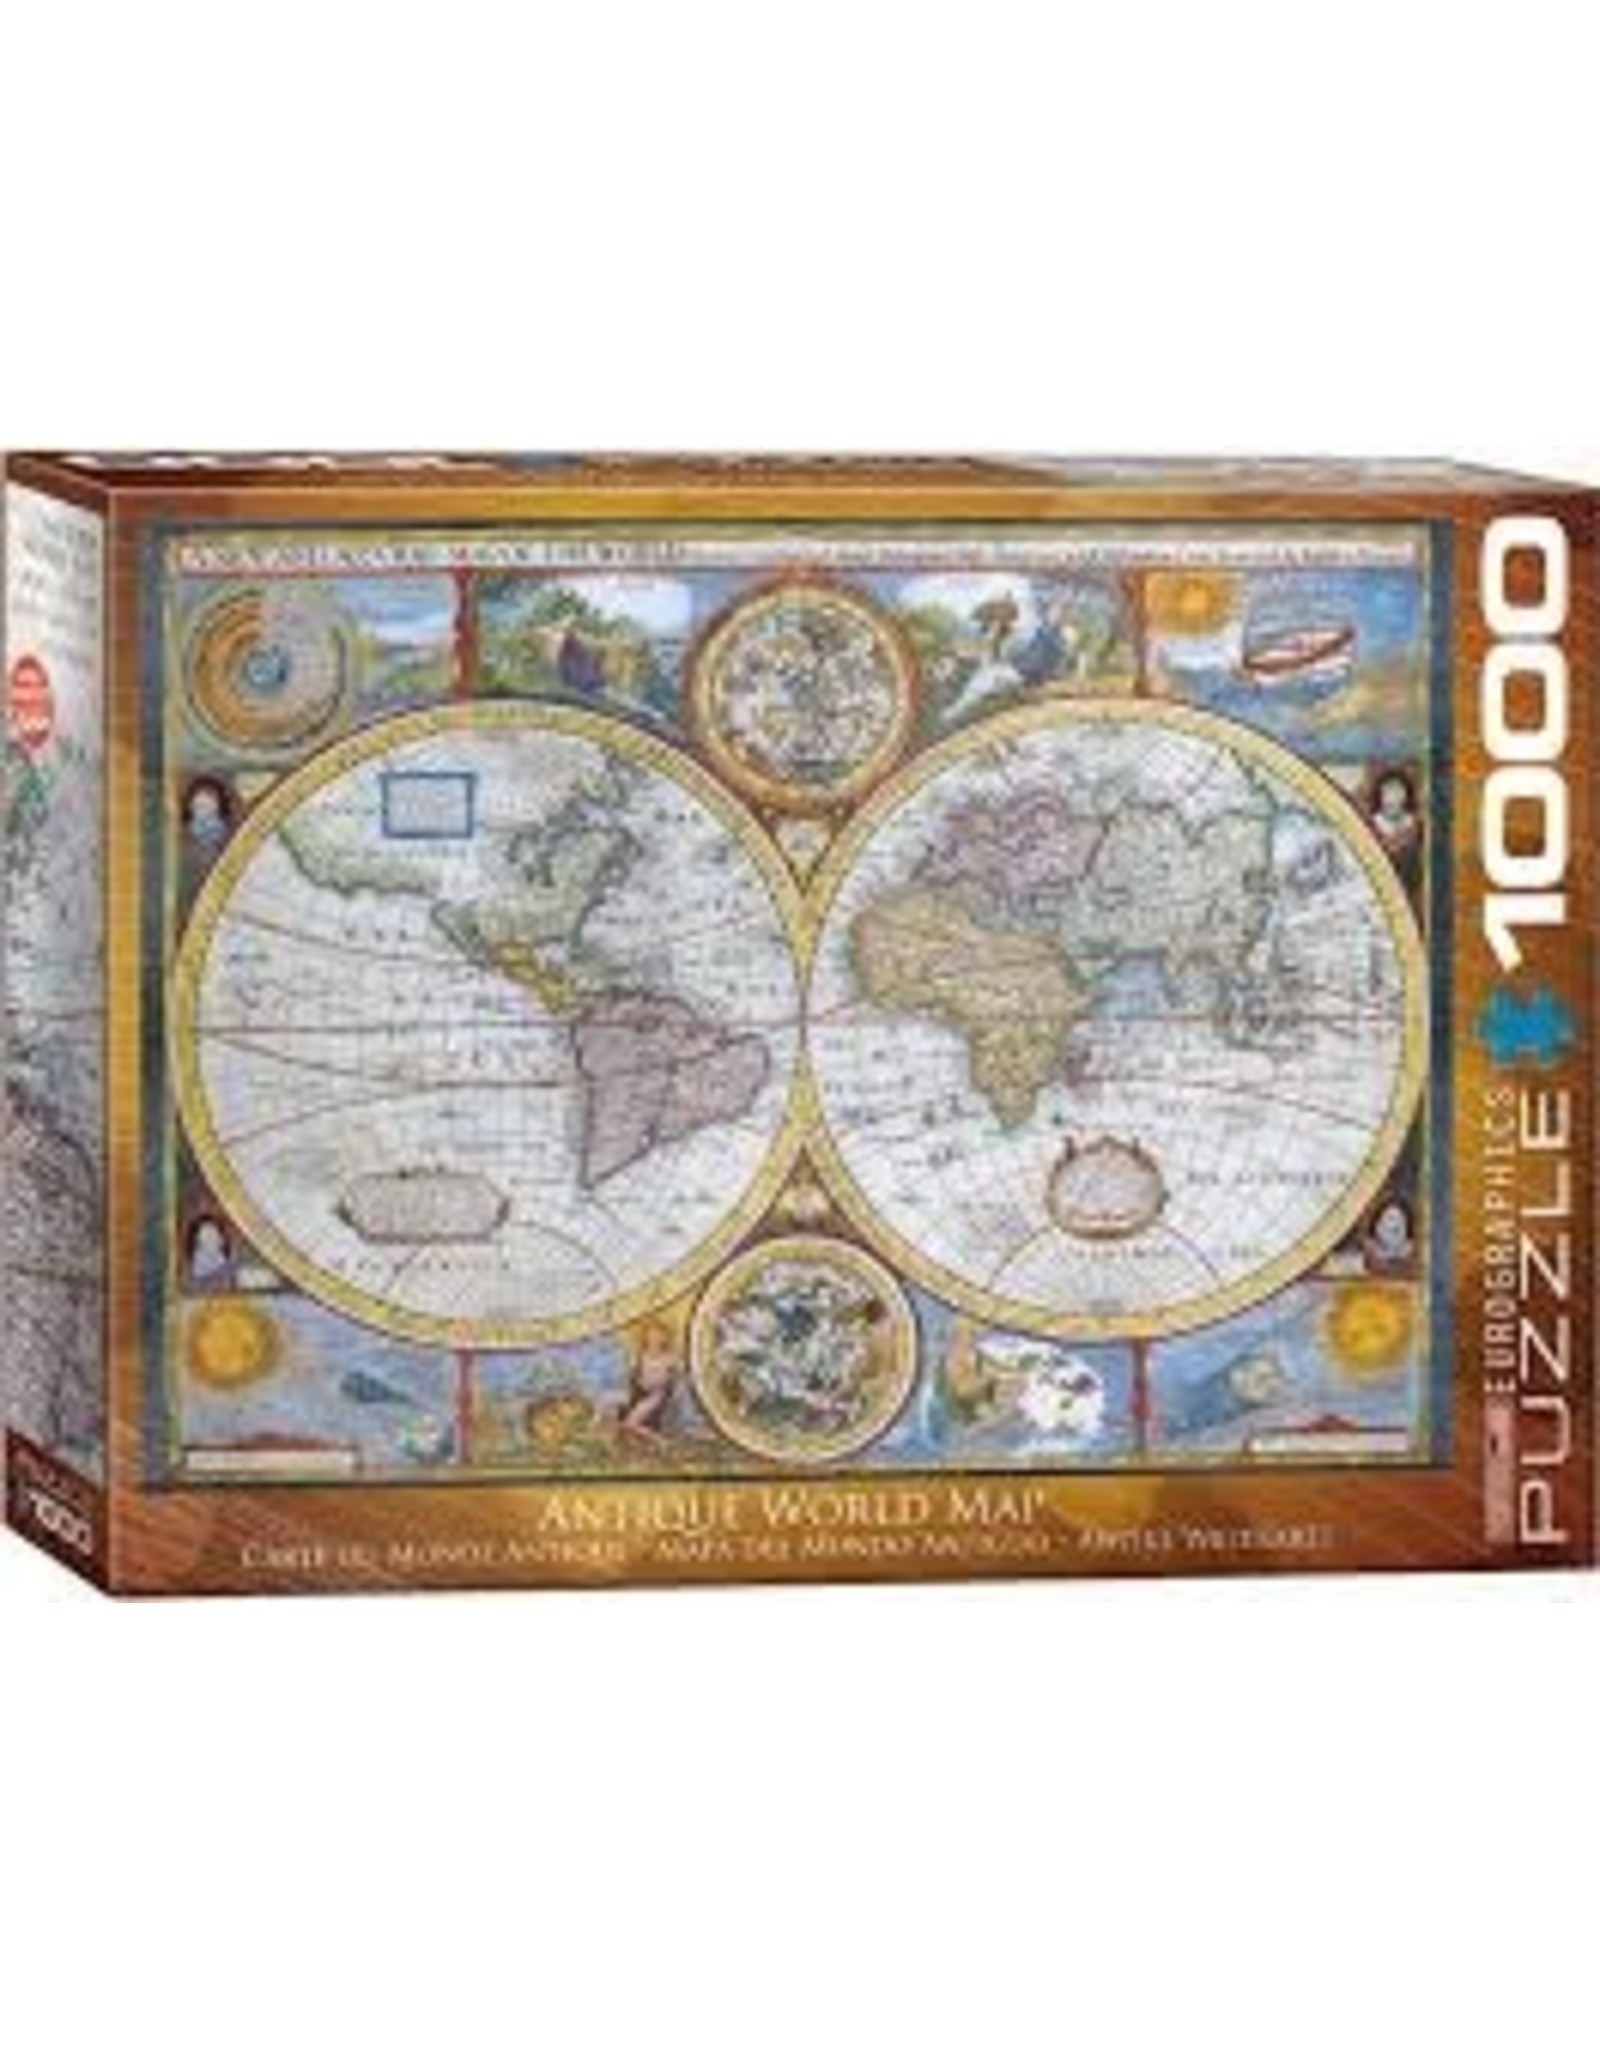 Eurographics Antique World Map 1000 pc